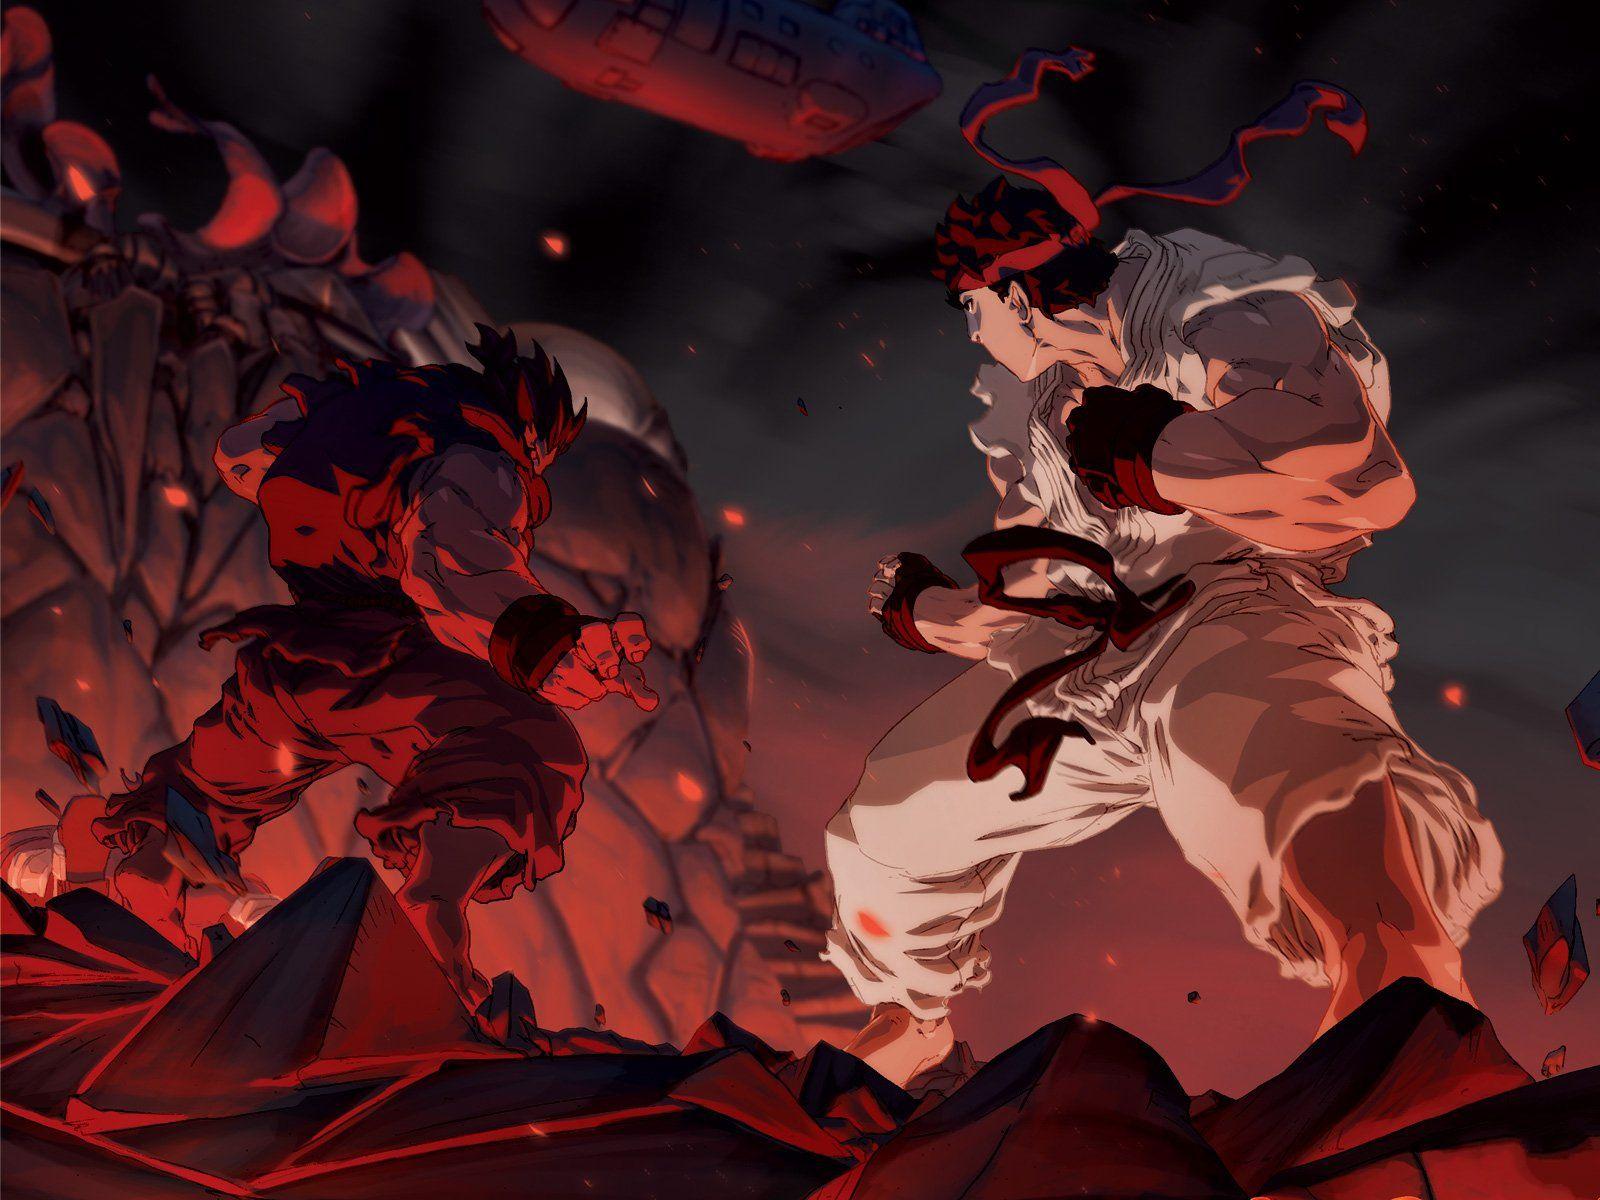 akuma street fighter wallpaper hd hd wallpapers download